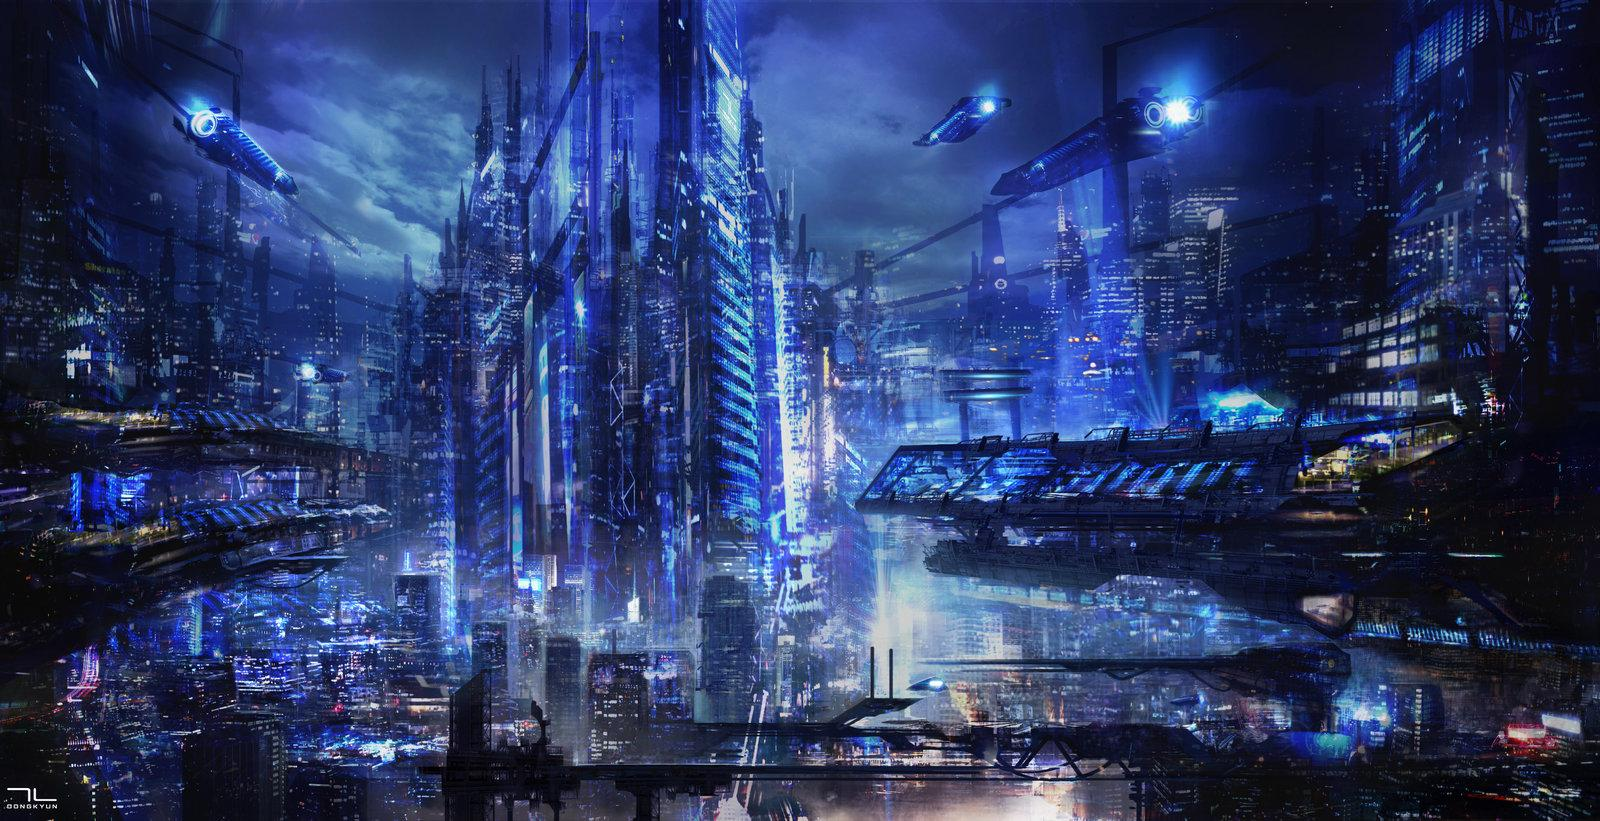 HD Future City Wallpaper